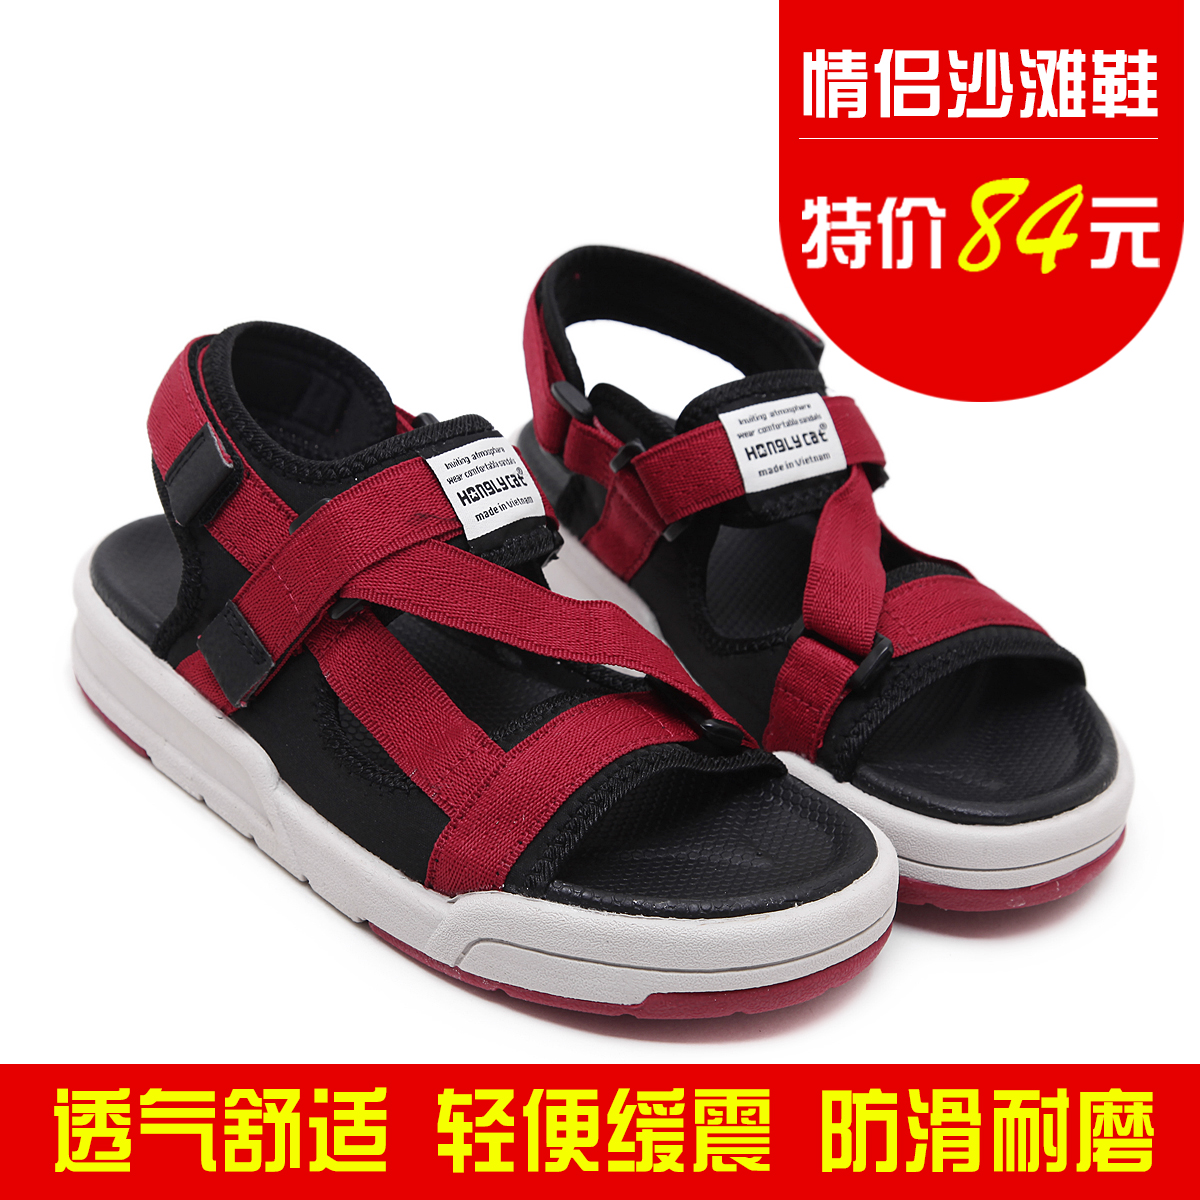 Sandals womens summer 2017 new Korean student flat Roman shoes womens Velcro couple sports beach sandals